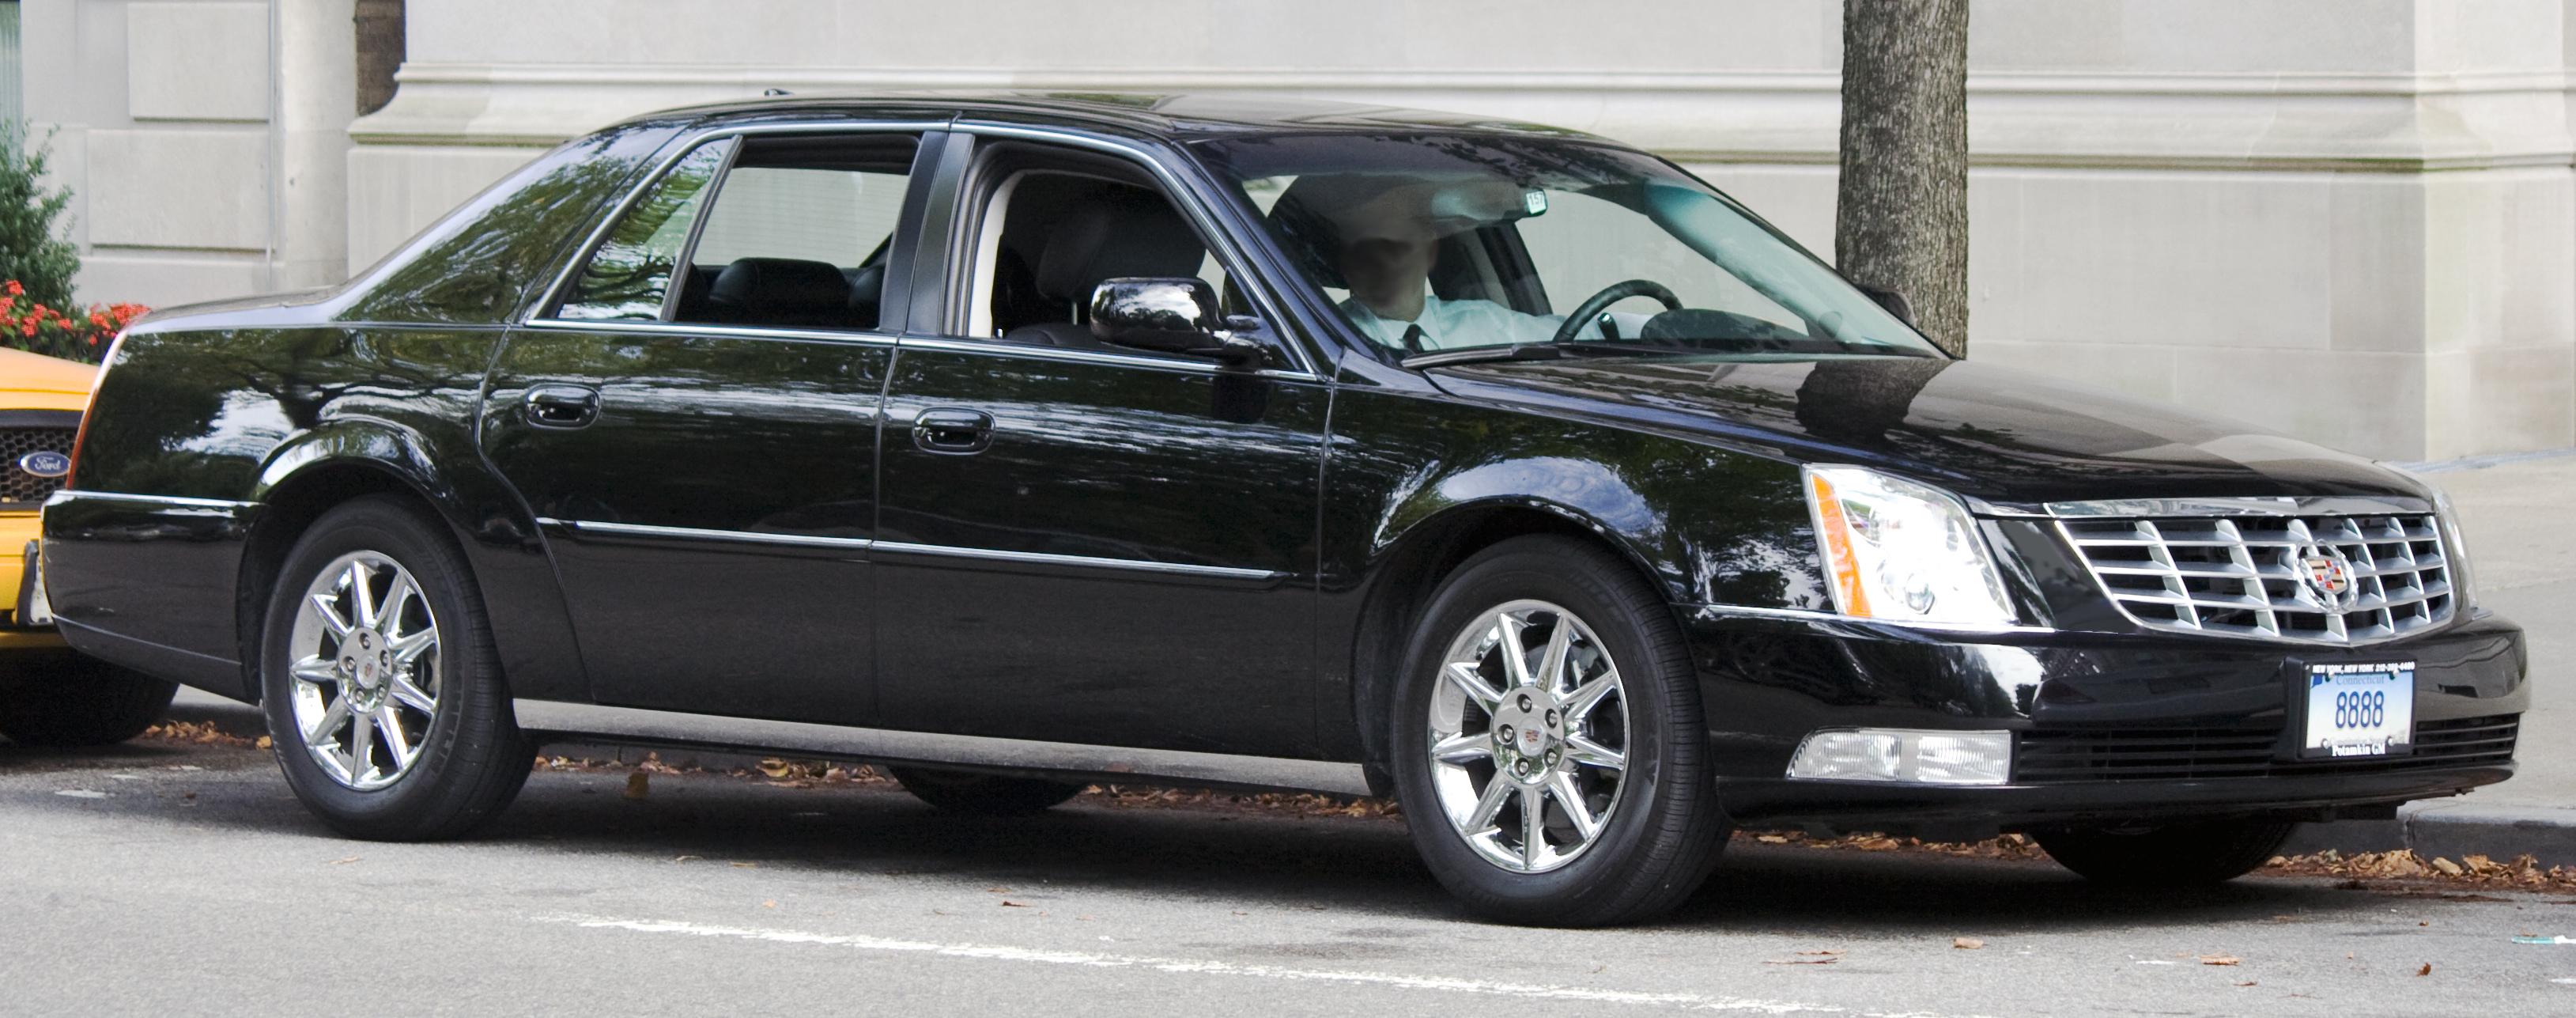 specs cadillac autoevolution cars dts